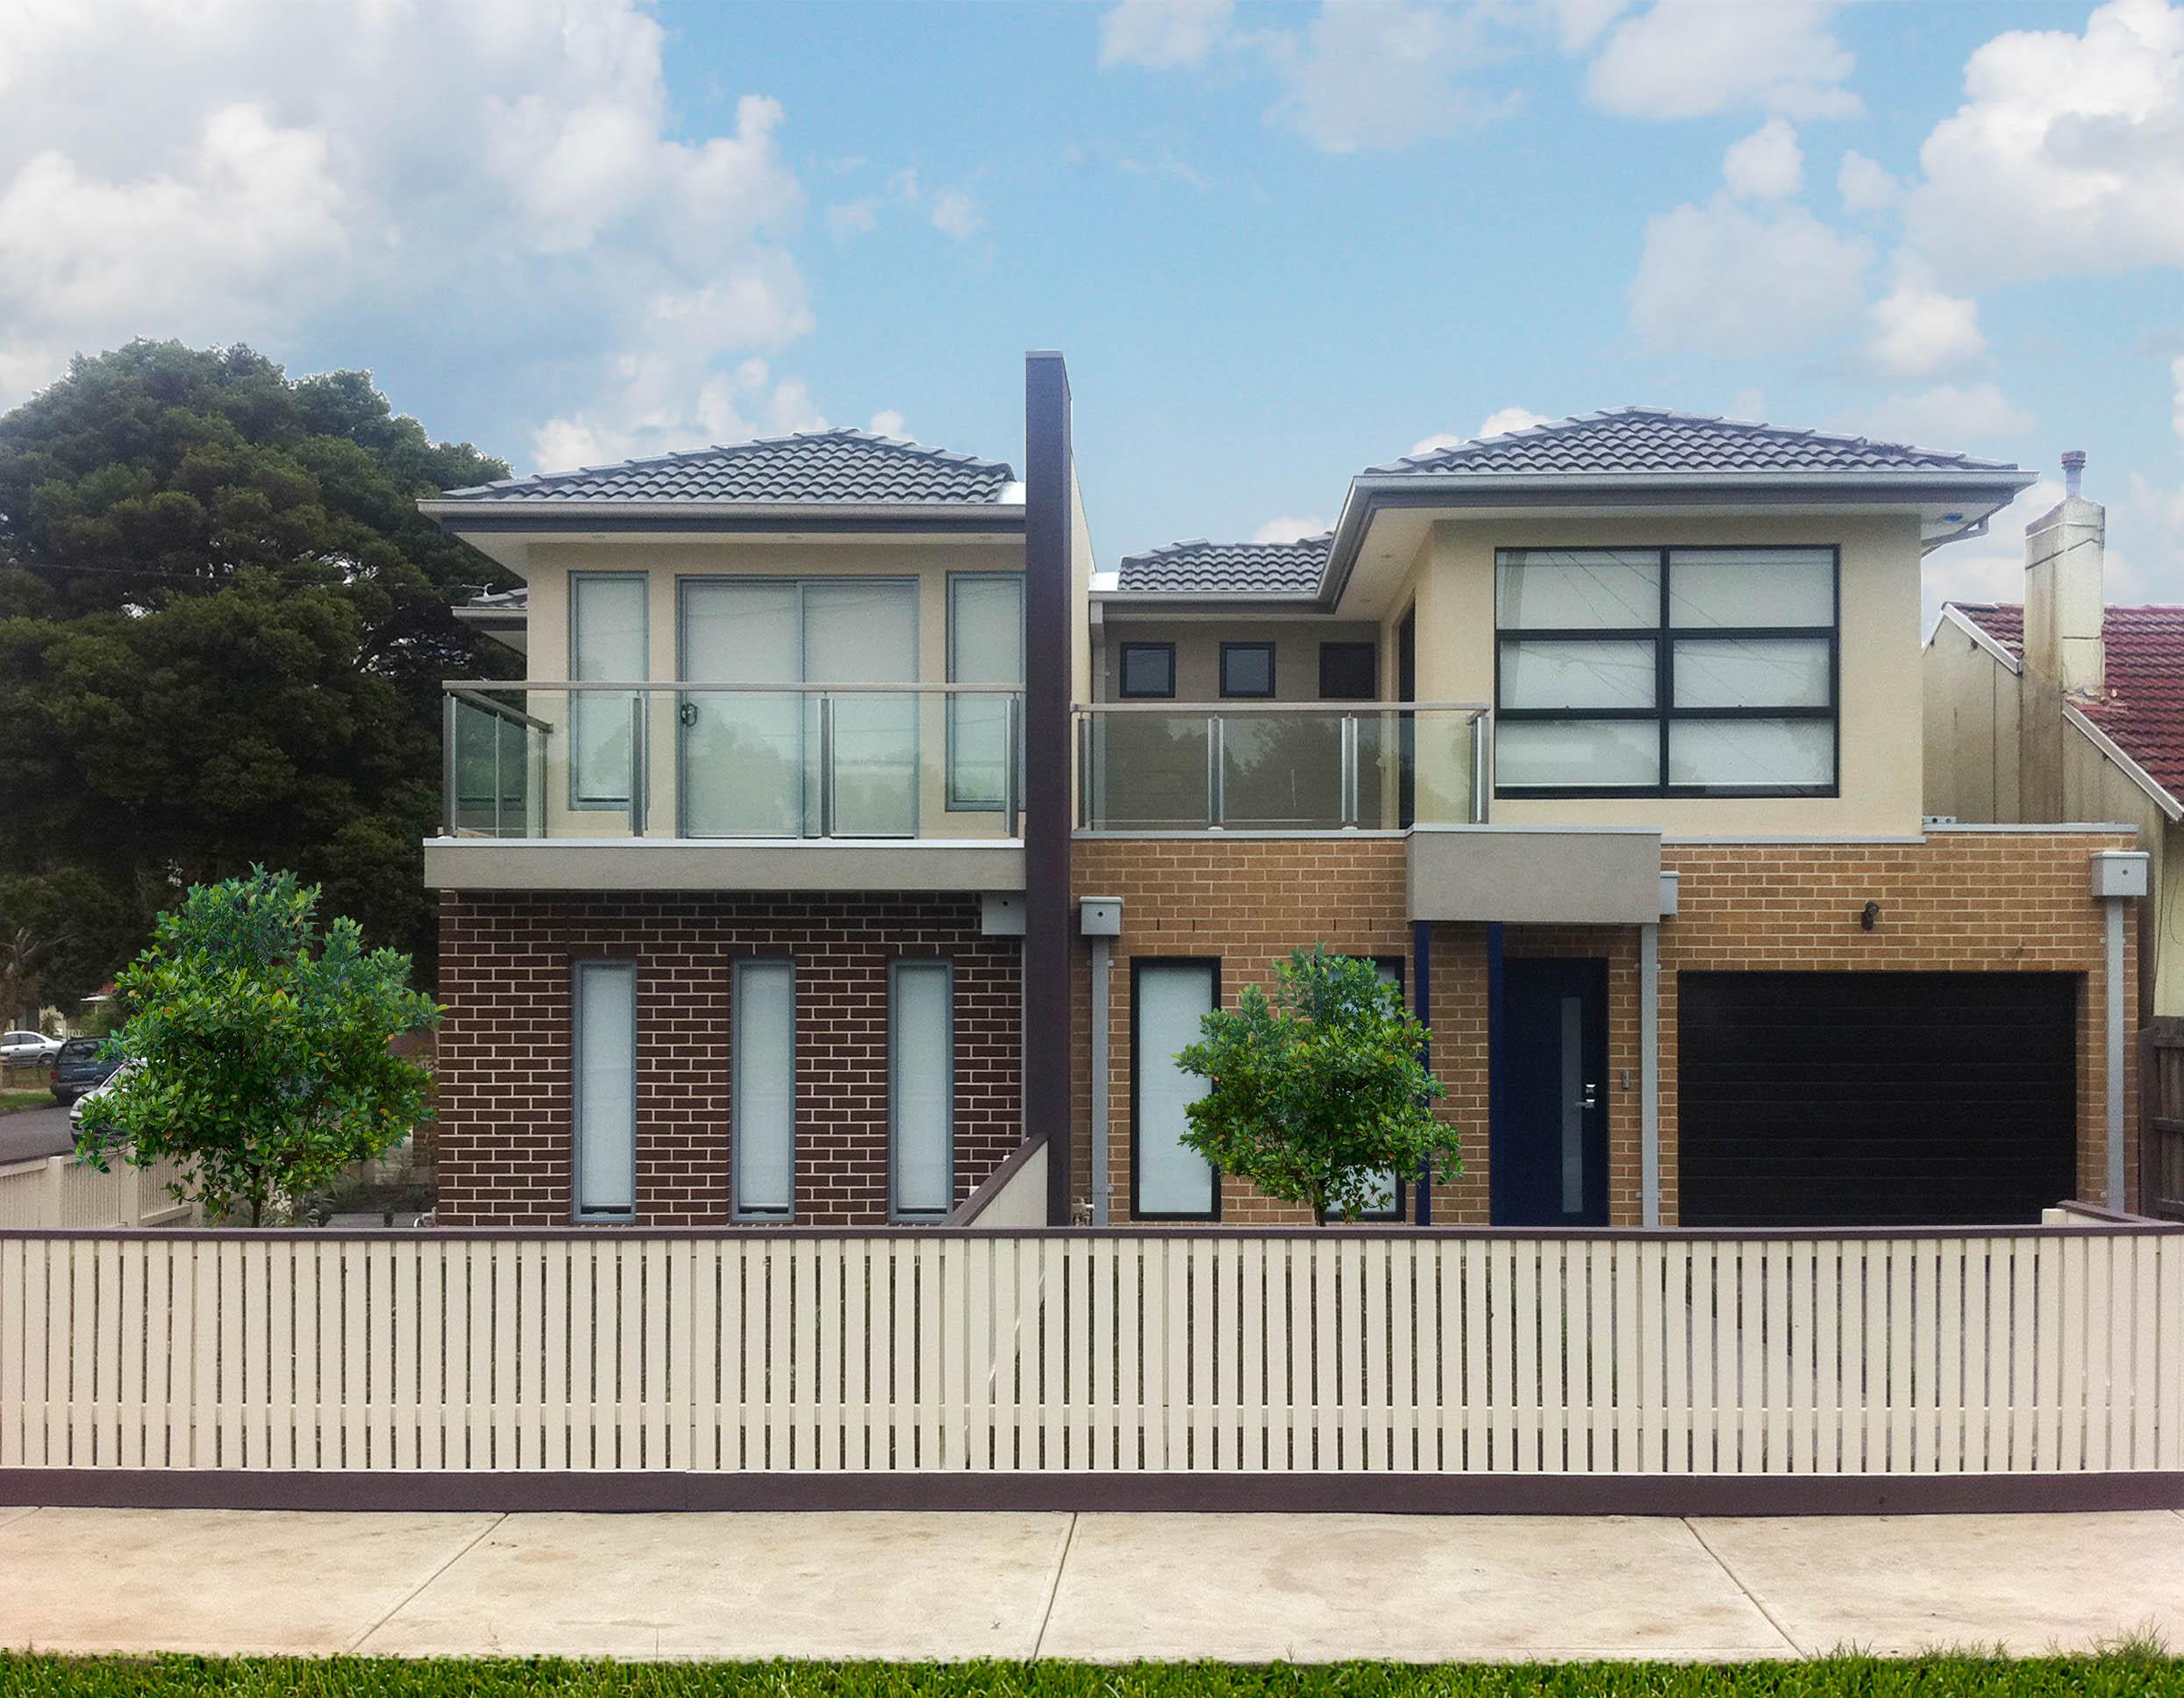 The Daisy Duplex Home Design Construction